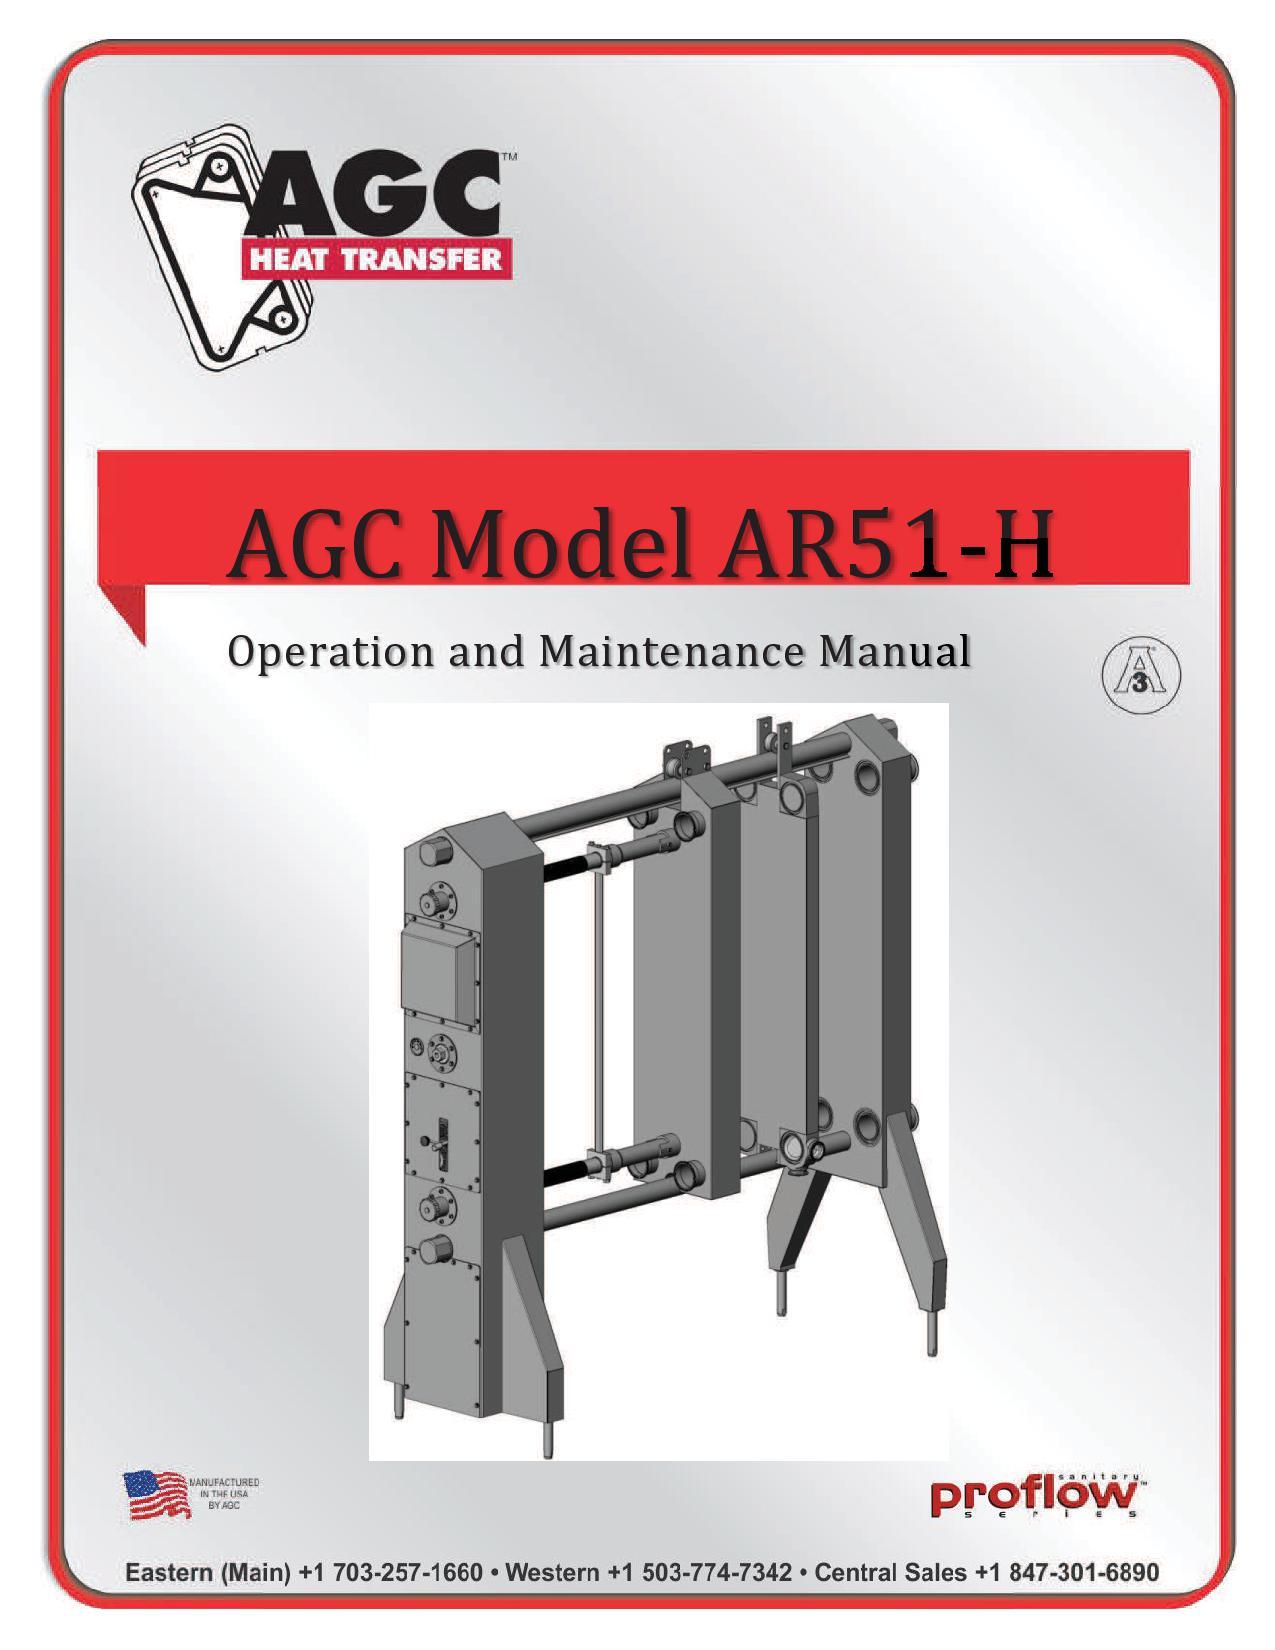 AGC Operating Manual AR51-H